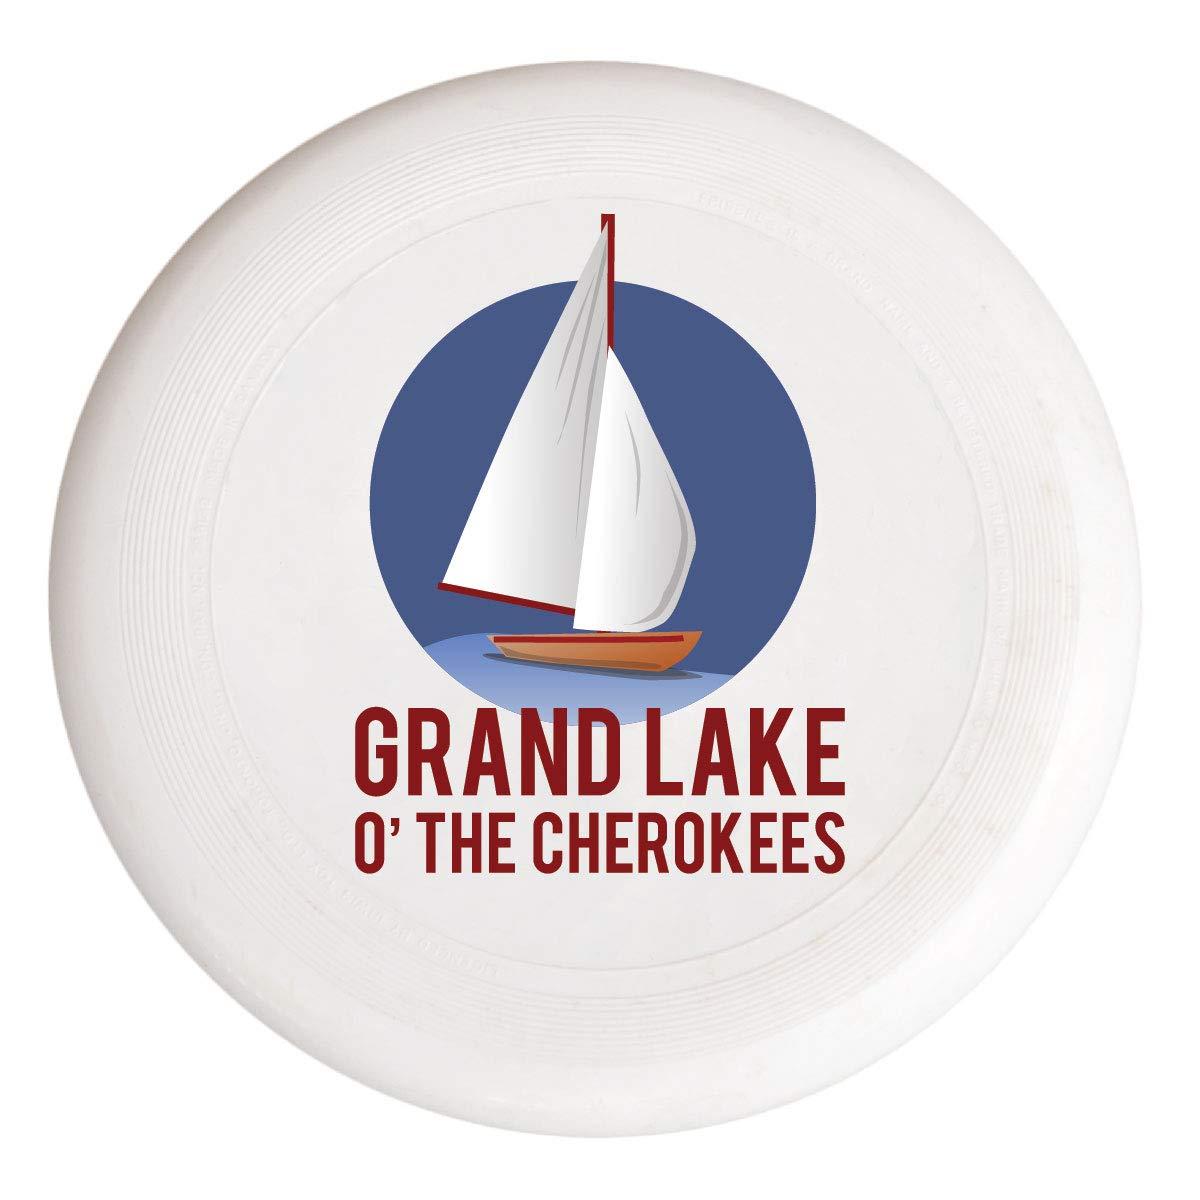 Grand Lake オクラホマ 航海 トレンディ お土産 フリスビー フライングディスク B07GVSMHVB